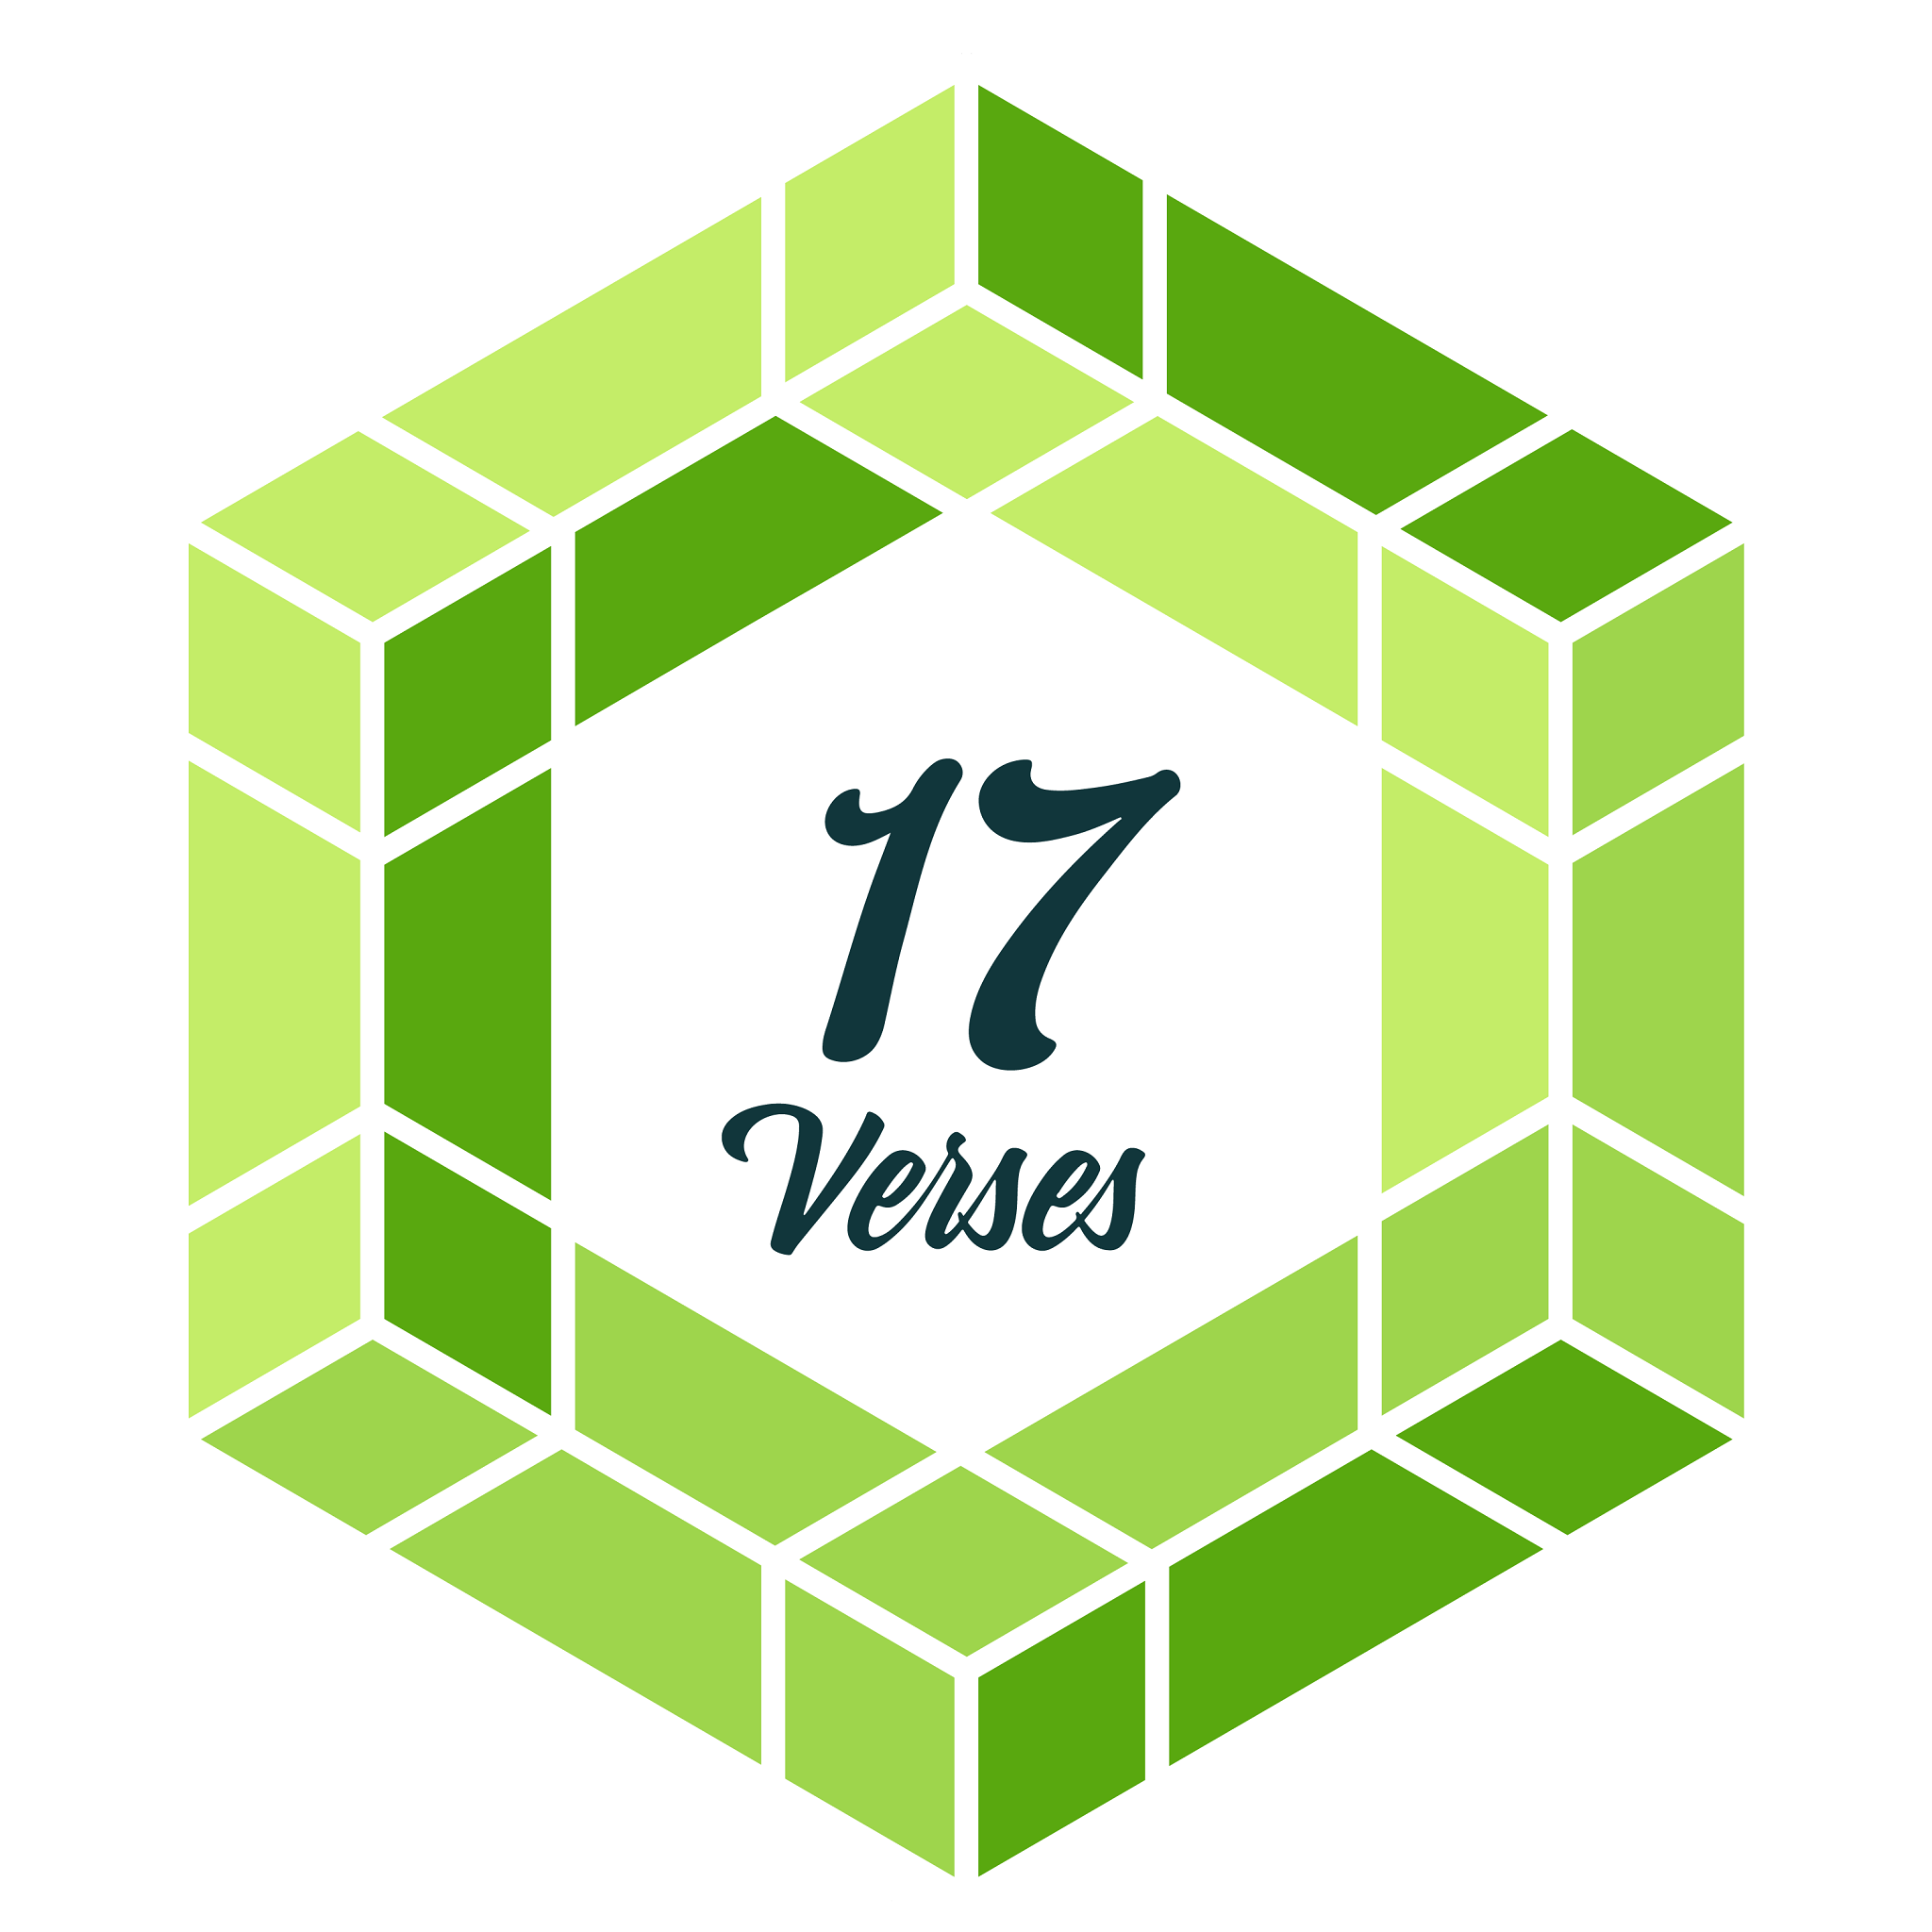 Year 2 - Surah 33 (Al-Ahzãb), Verses 53-73